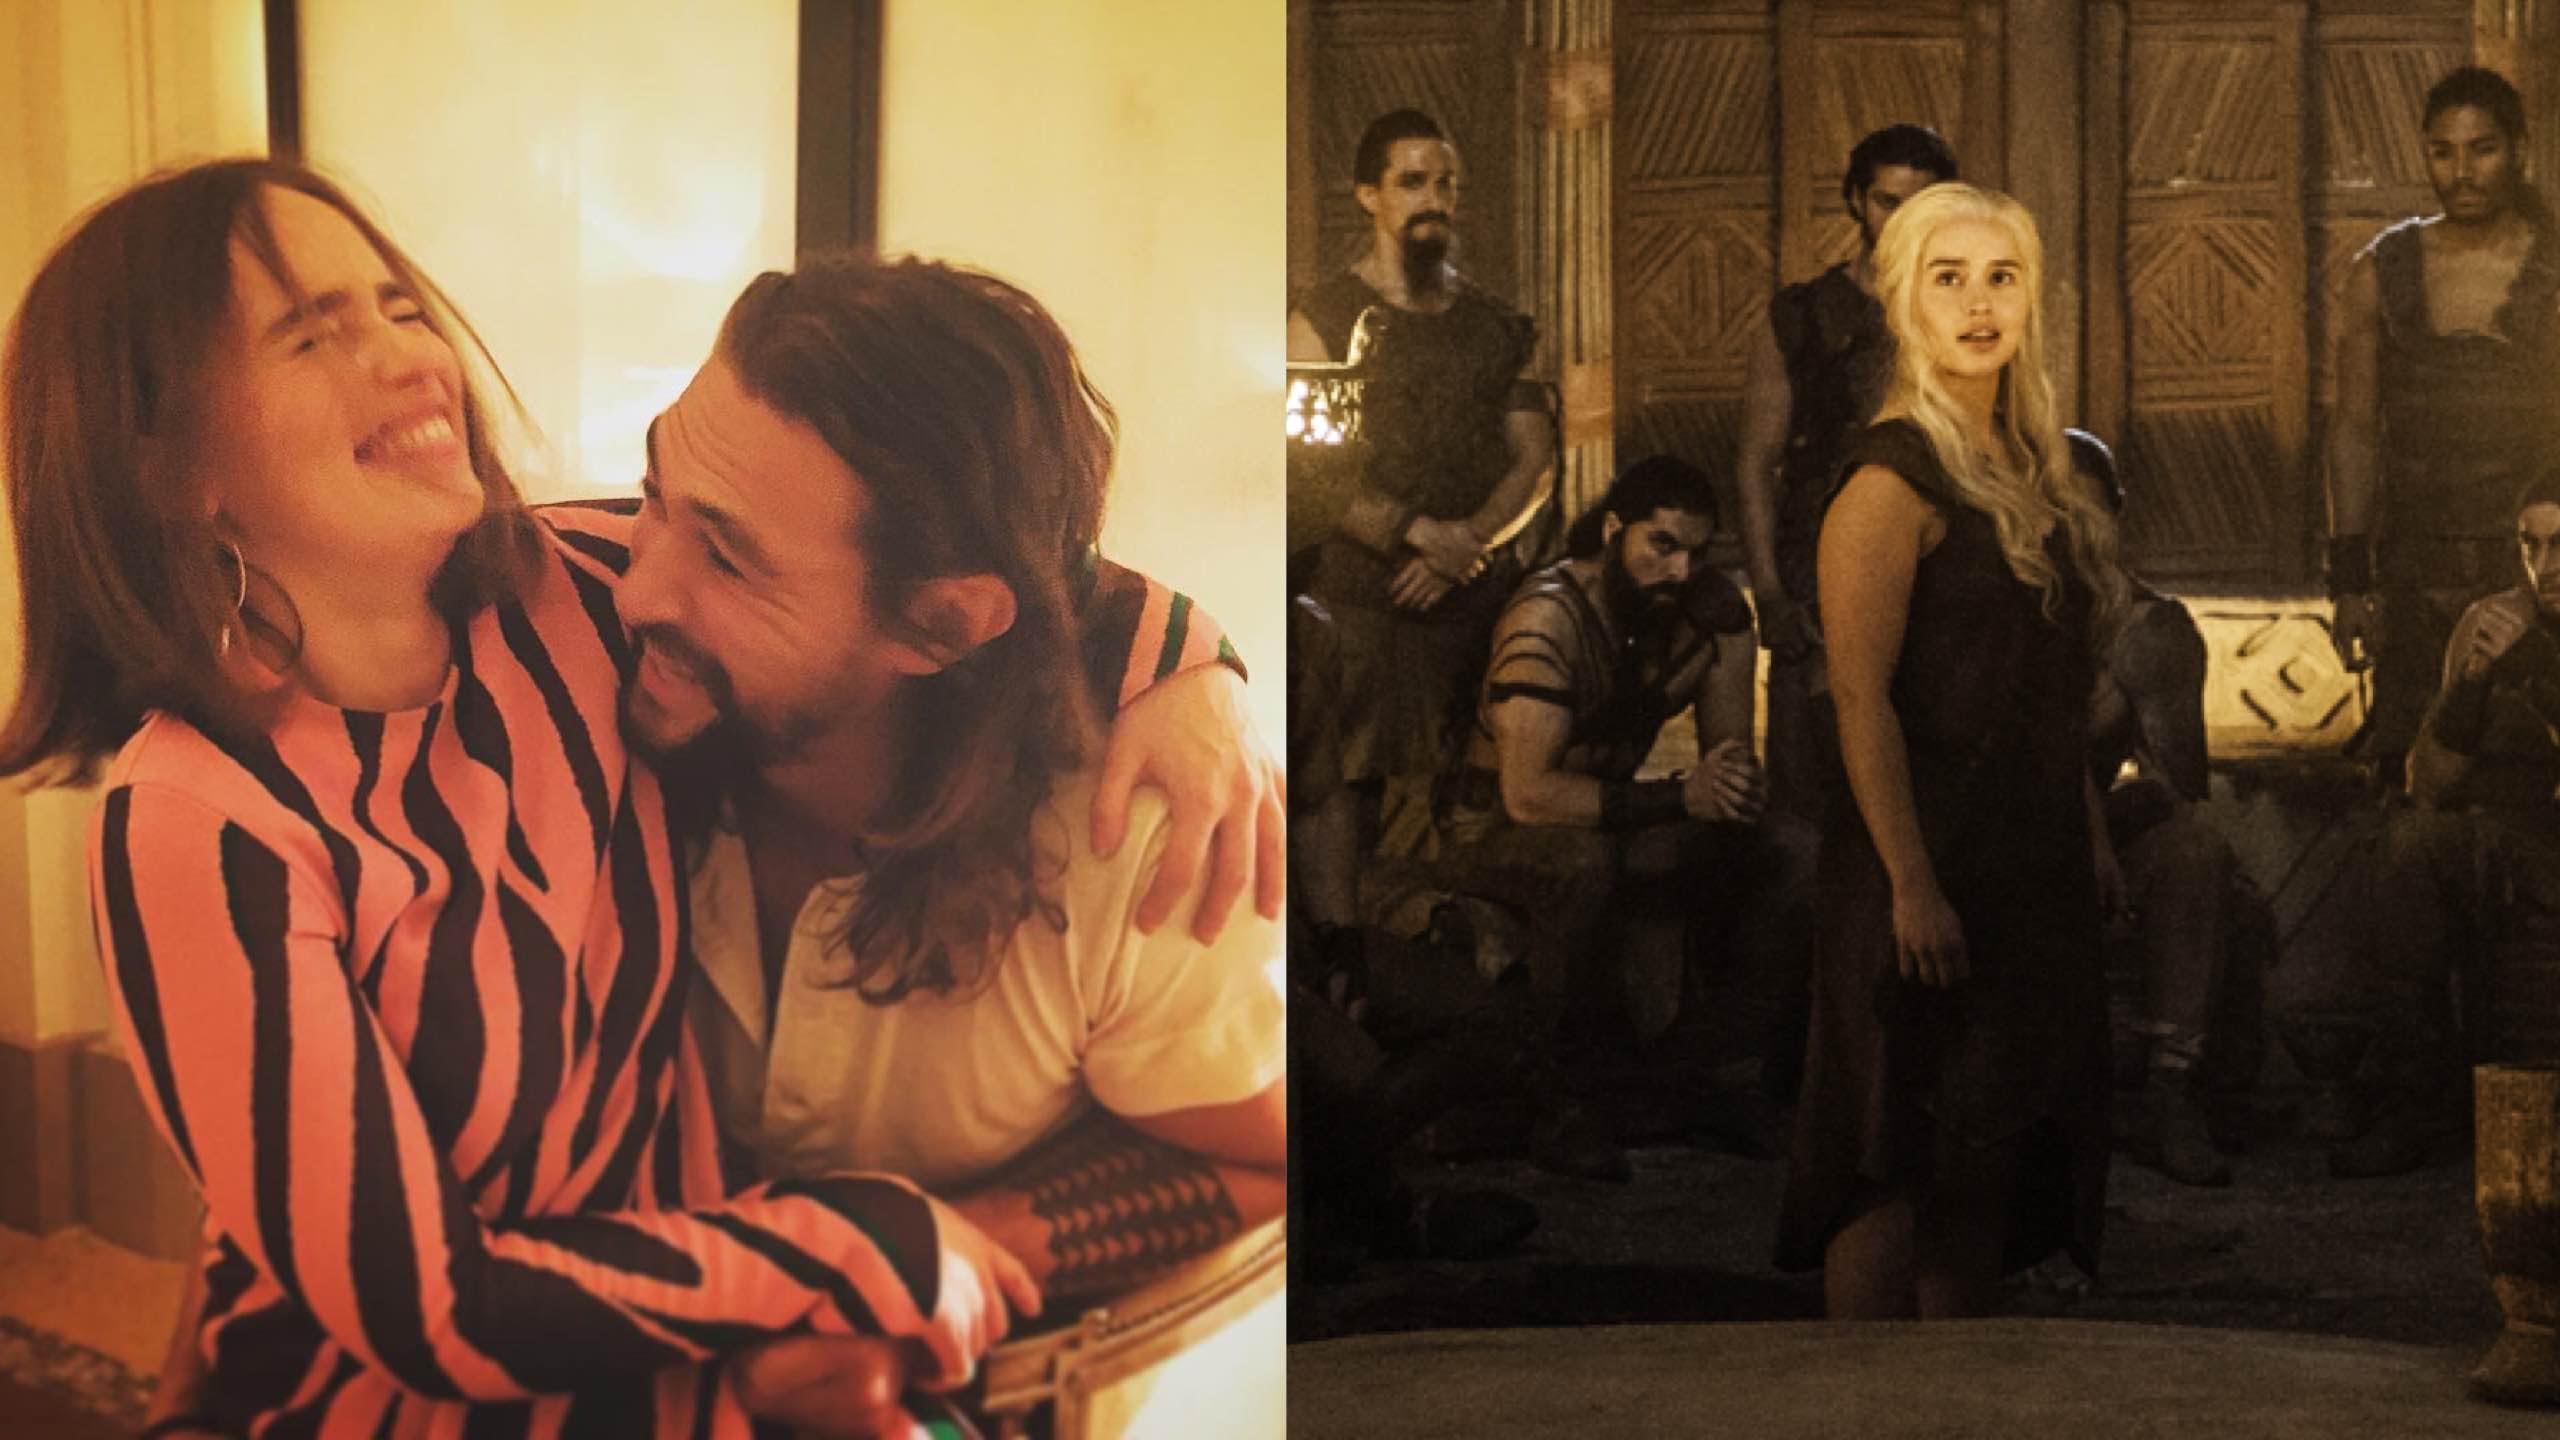 Look Jason Momoa Cheers On His Boo Khaleesi On Game Of Thrones